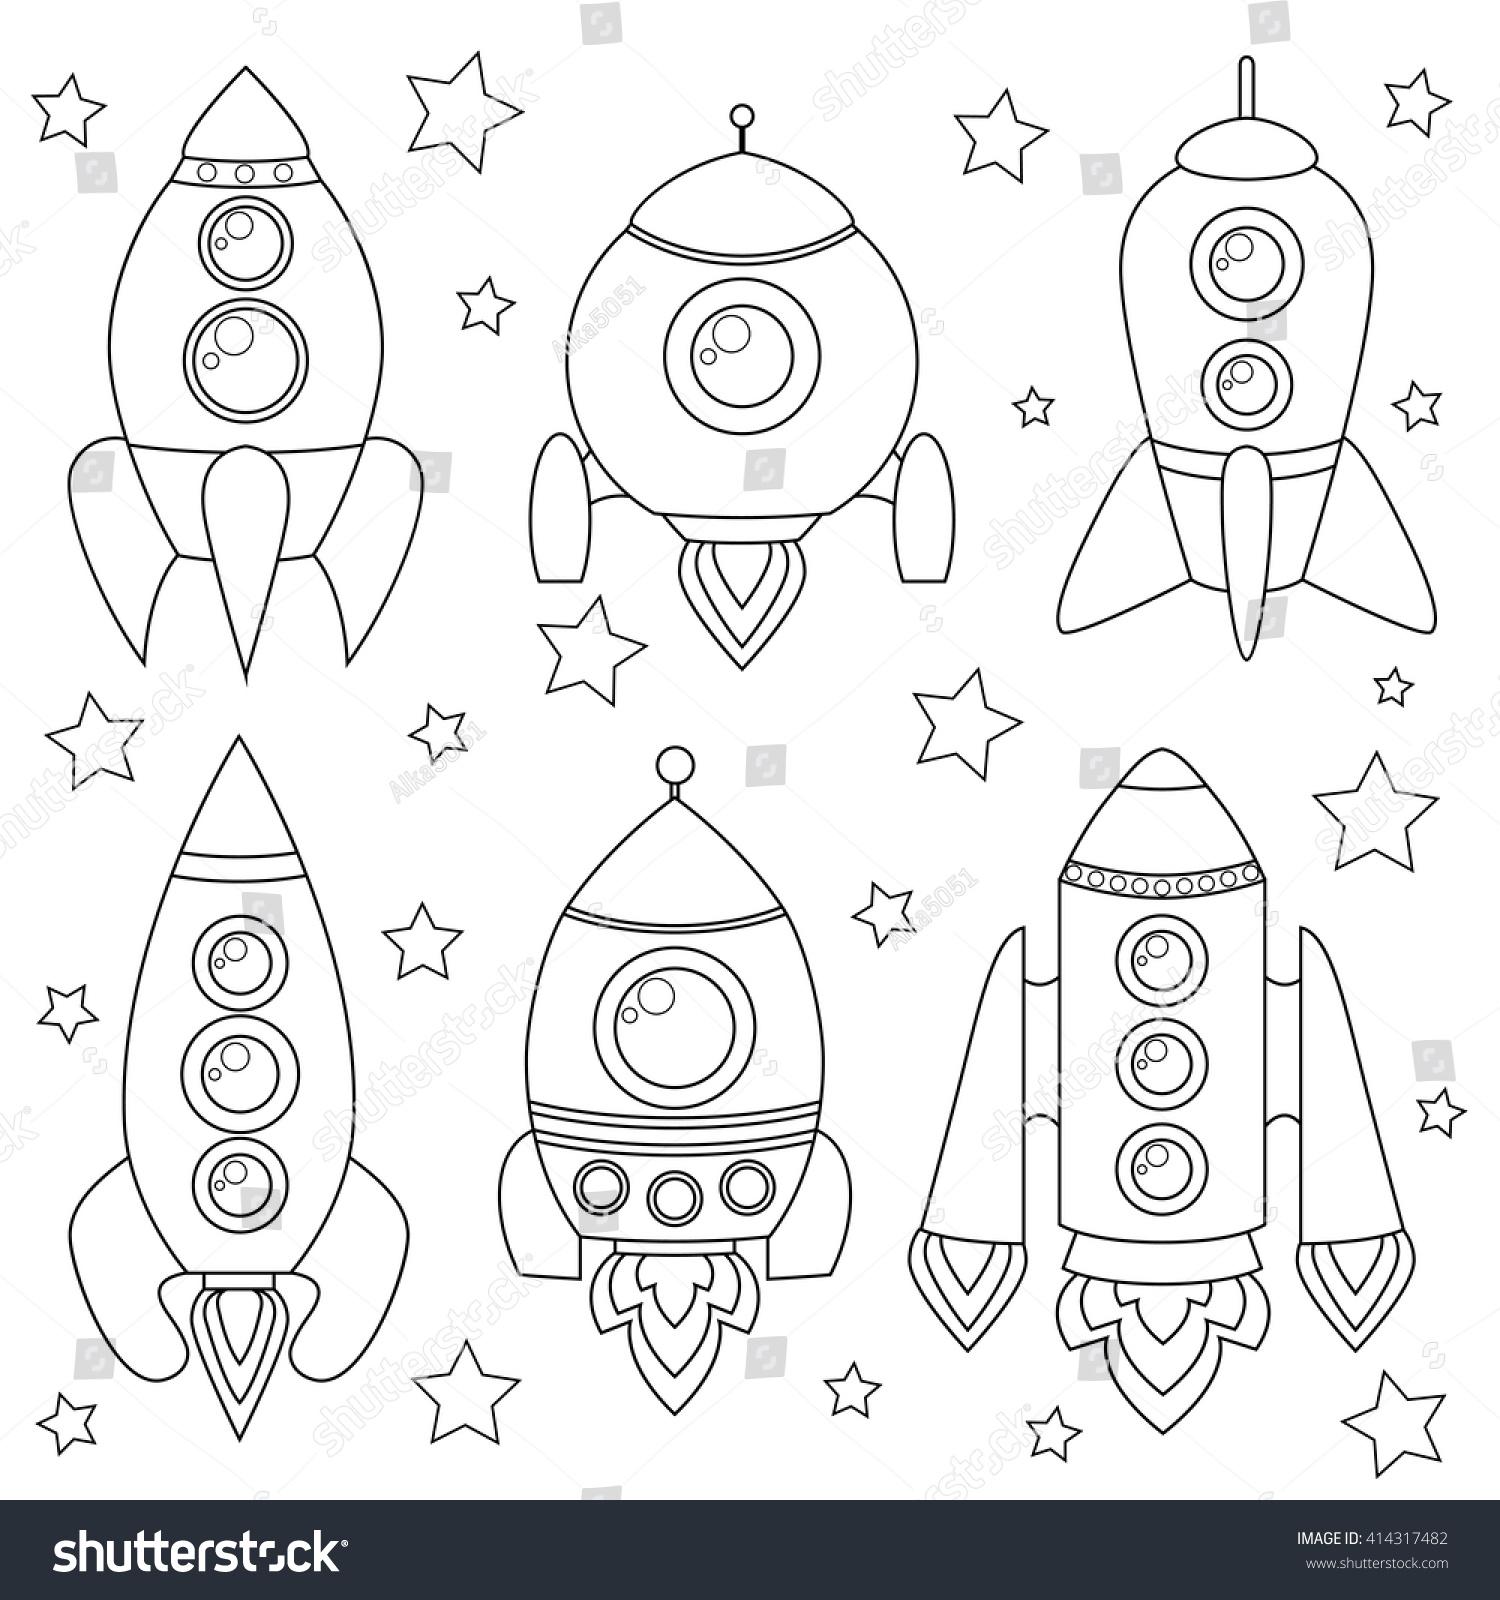 cartoon spaceship black white illustration coloring stock vector